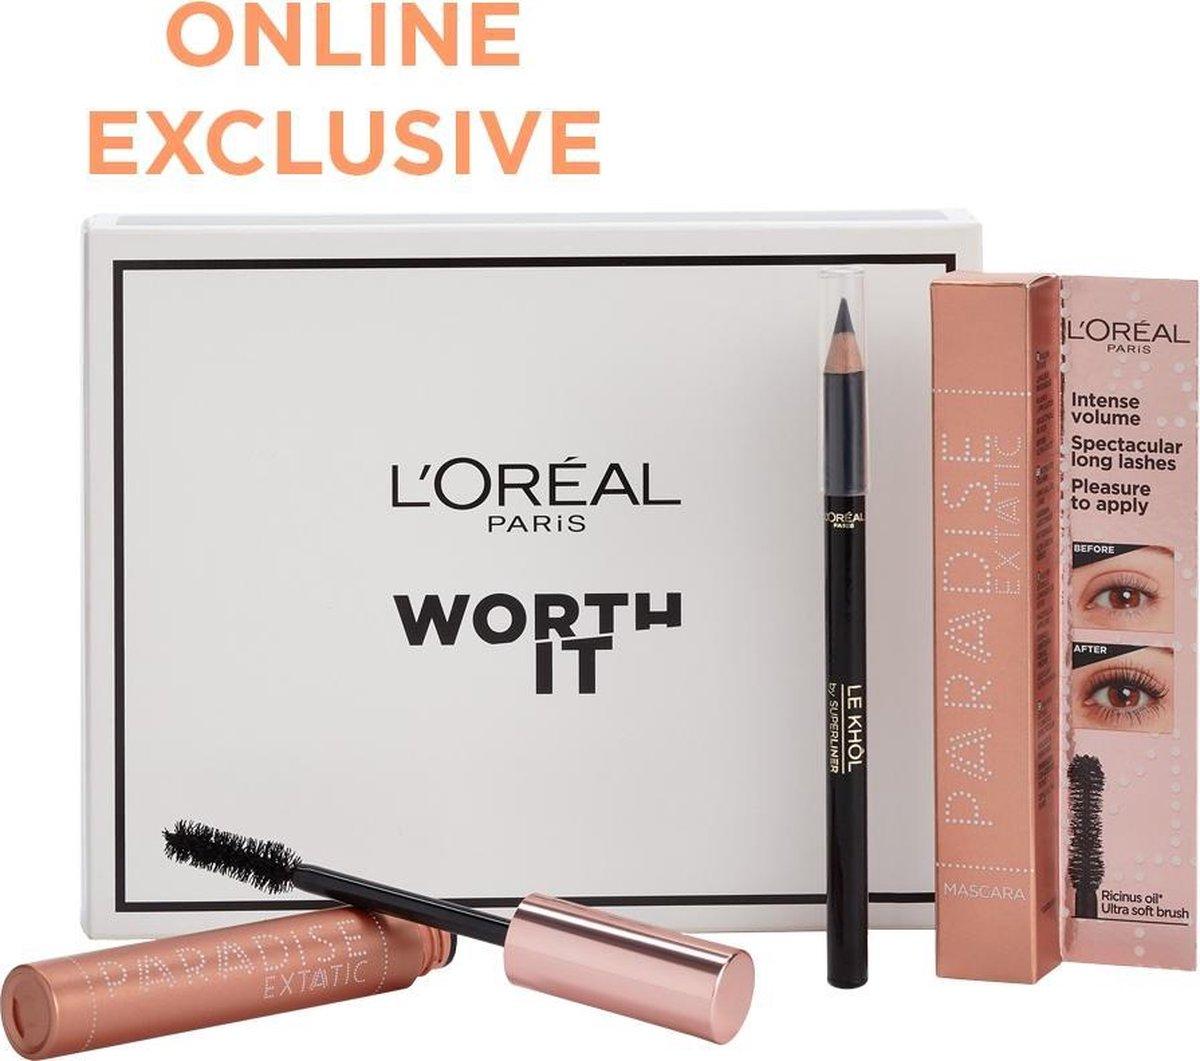 L'Oréal Paris Paradise Extatic Mascara Voordeelverpakking - Mega Volume Mascara en Oogpotlood